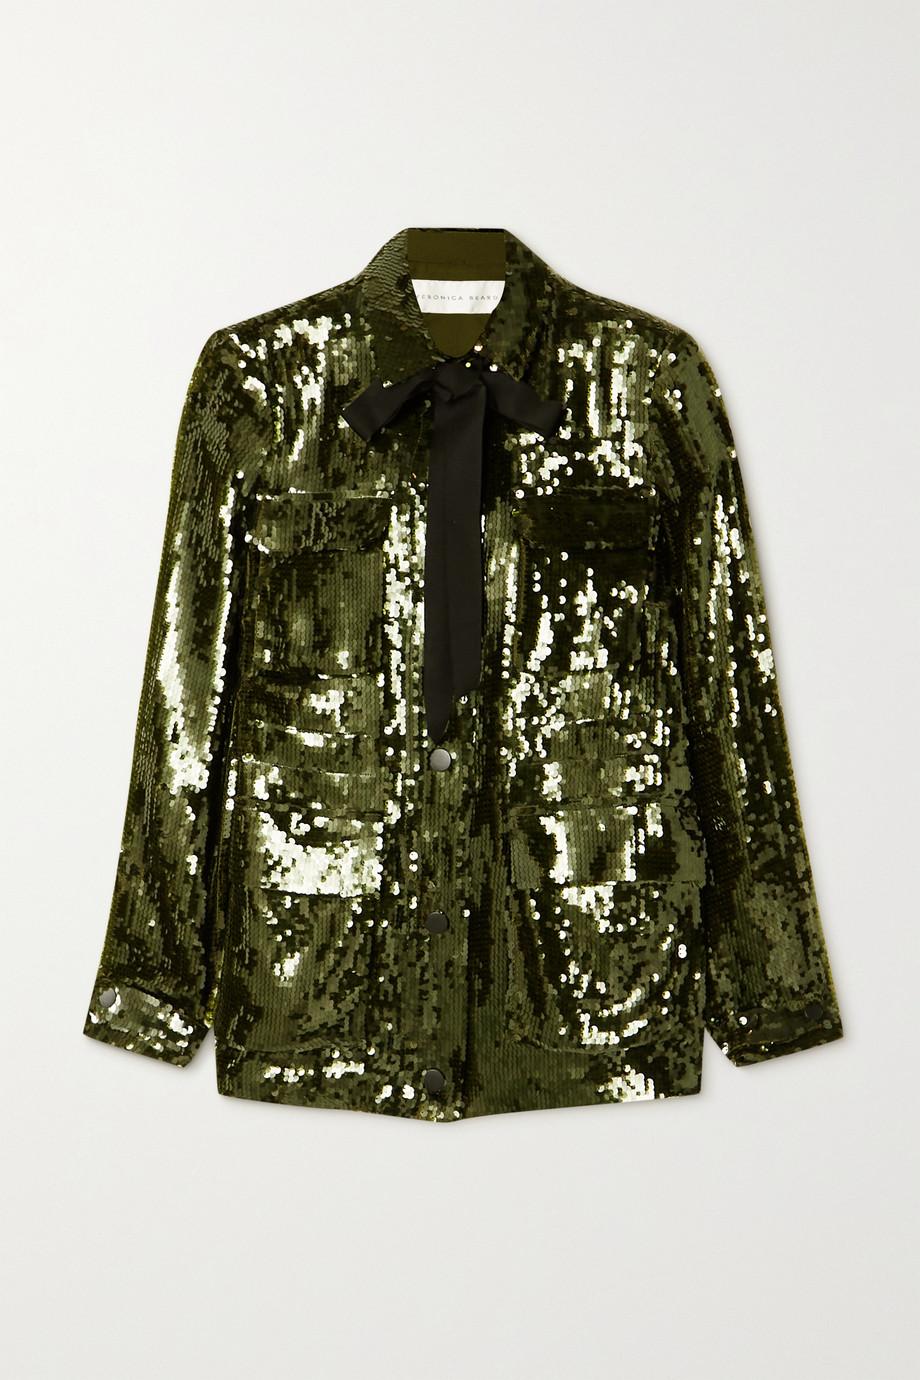 Veronica Beard Oriana tie-detailed sequined crepe jacket